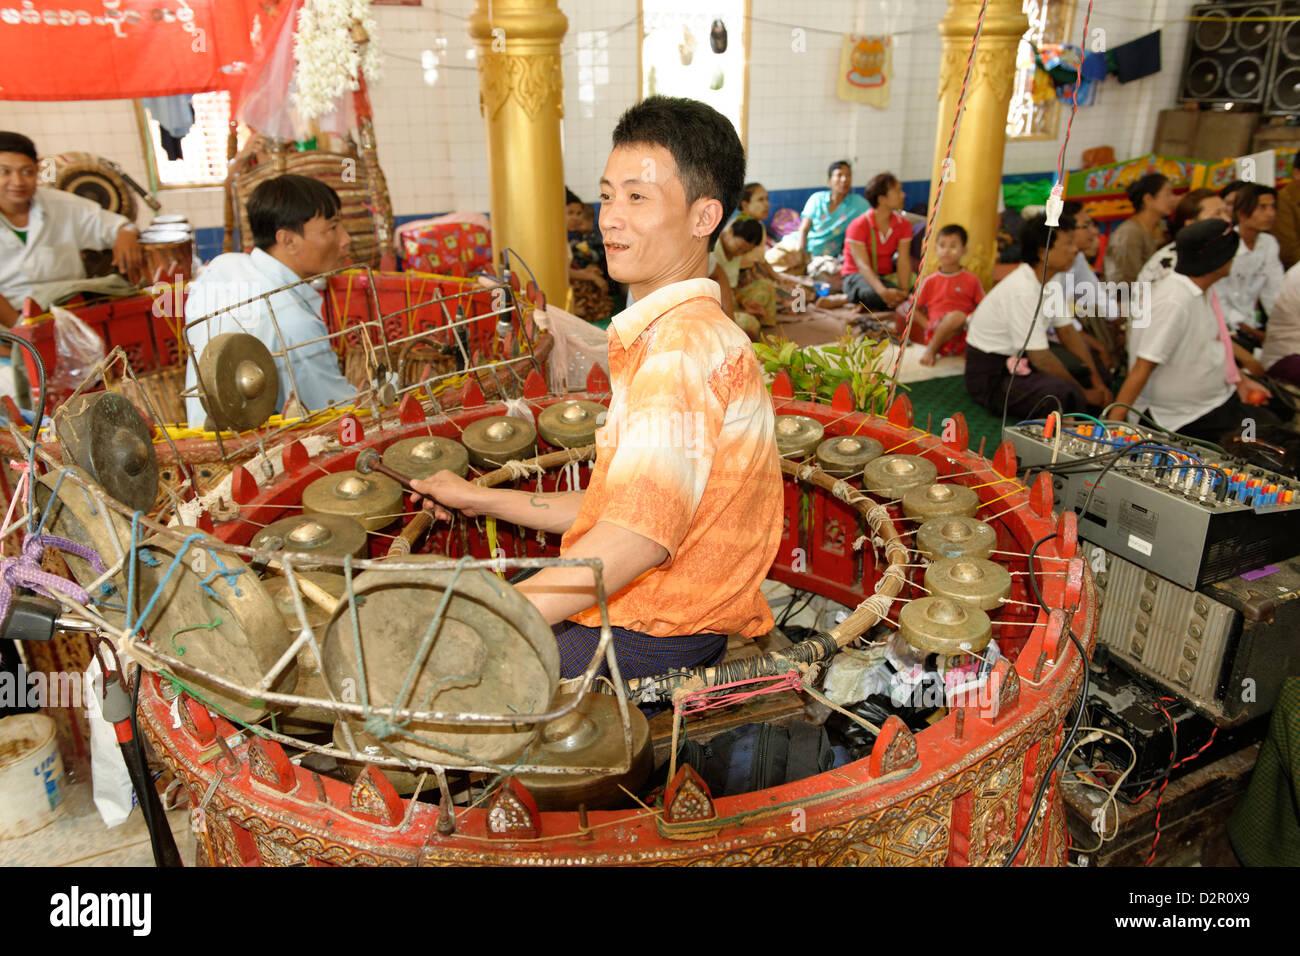 Il hsaing waing, un tradizionale birmana folk ensemble musicale, Festival di Ko Myo Shin, Pyin U Lwin, Mandalay Immagini Stock